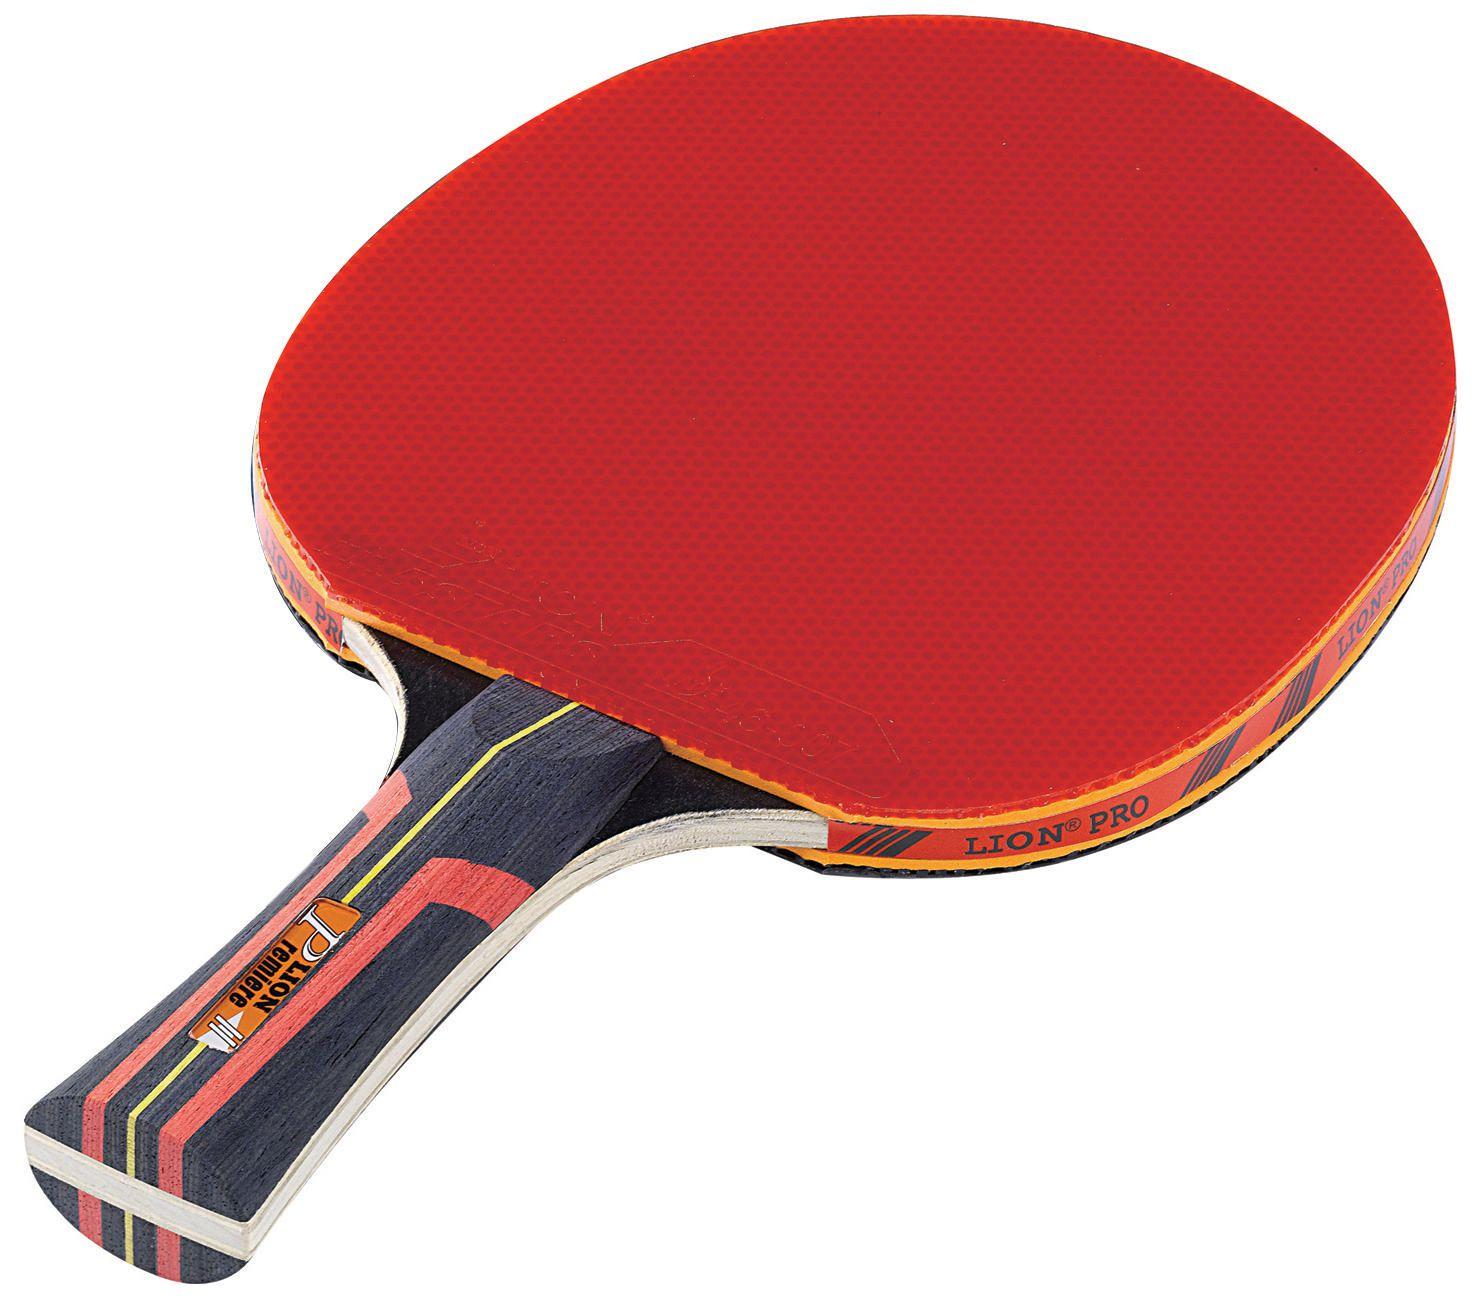 Swiftflyte Premier Series Table Tennis Racket Walmart Canada